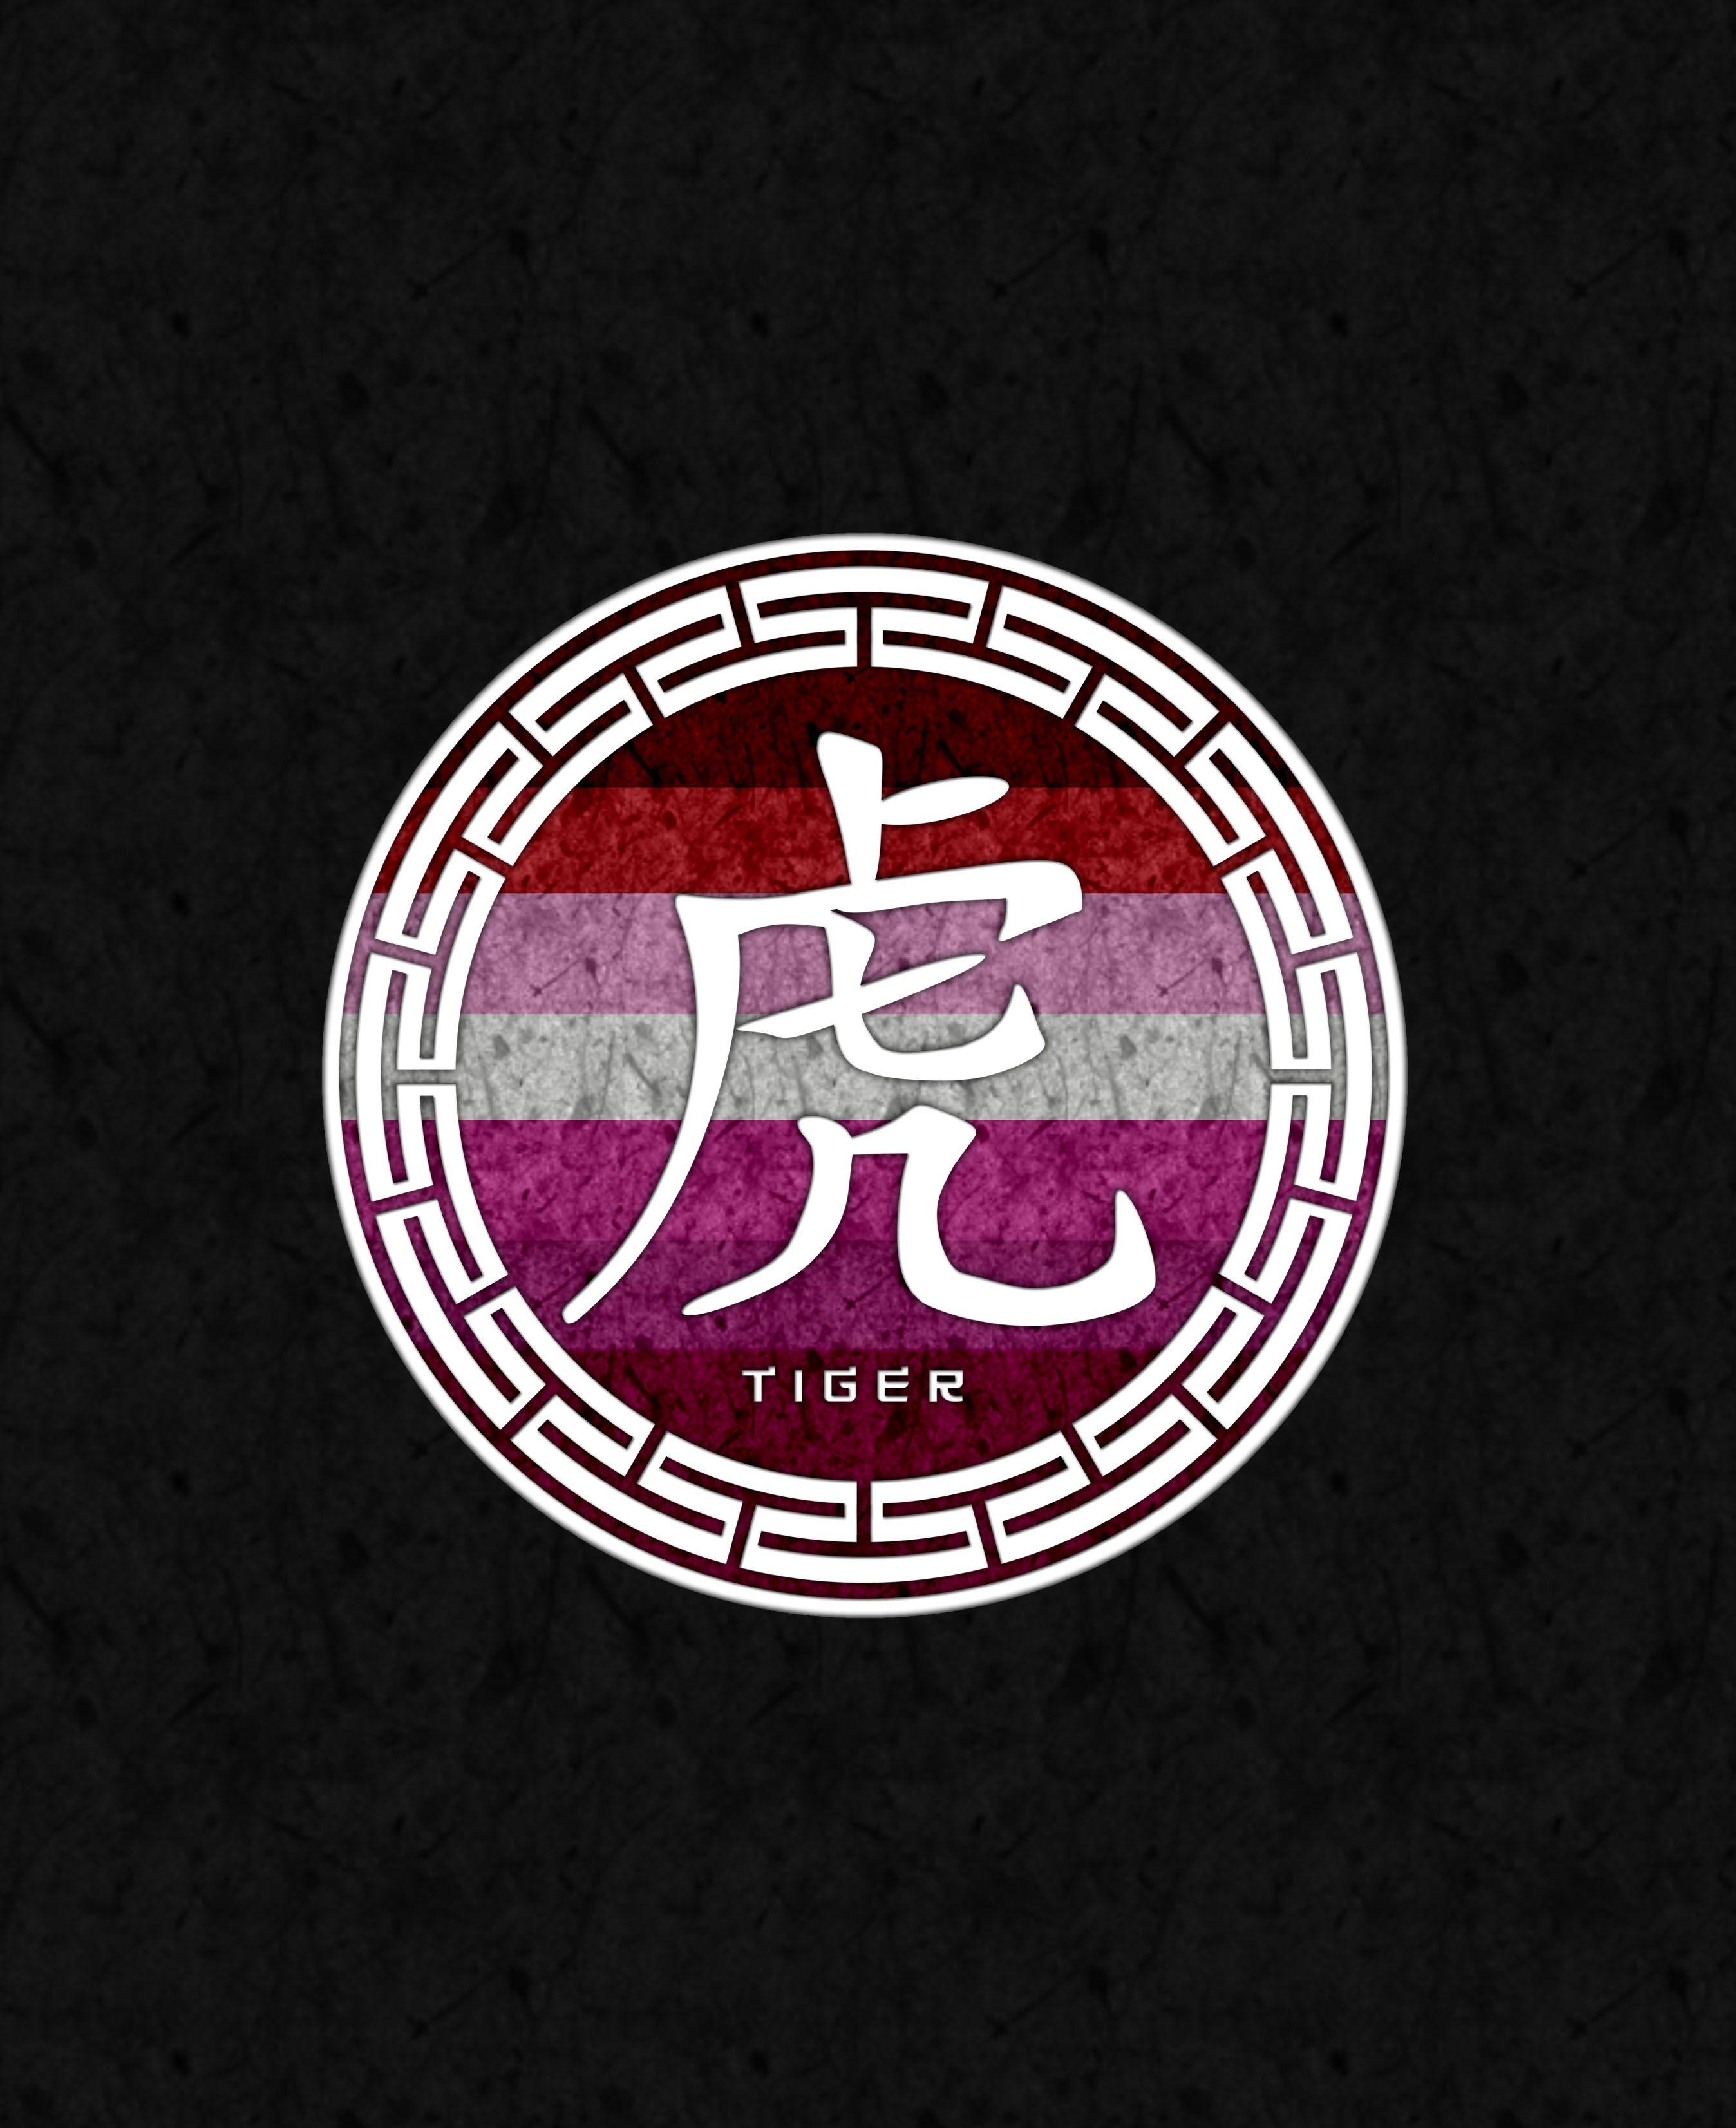 Tiger chinese zodiac lipstick lesbian pride lipstick lesbian tiger chinese zodiac lipstick lesbian pride lipstick lesbian pride chinese horoscope tiger symbol in buycottarizona